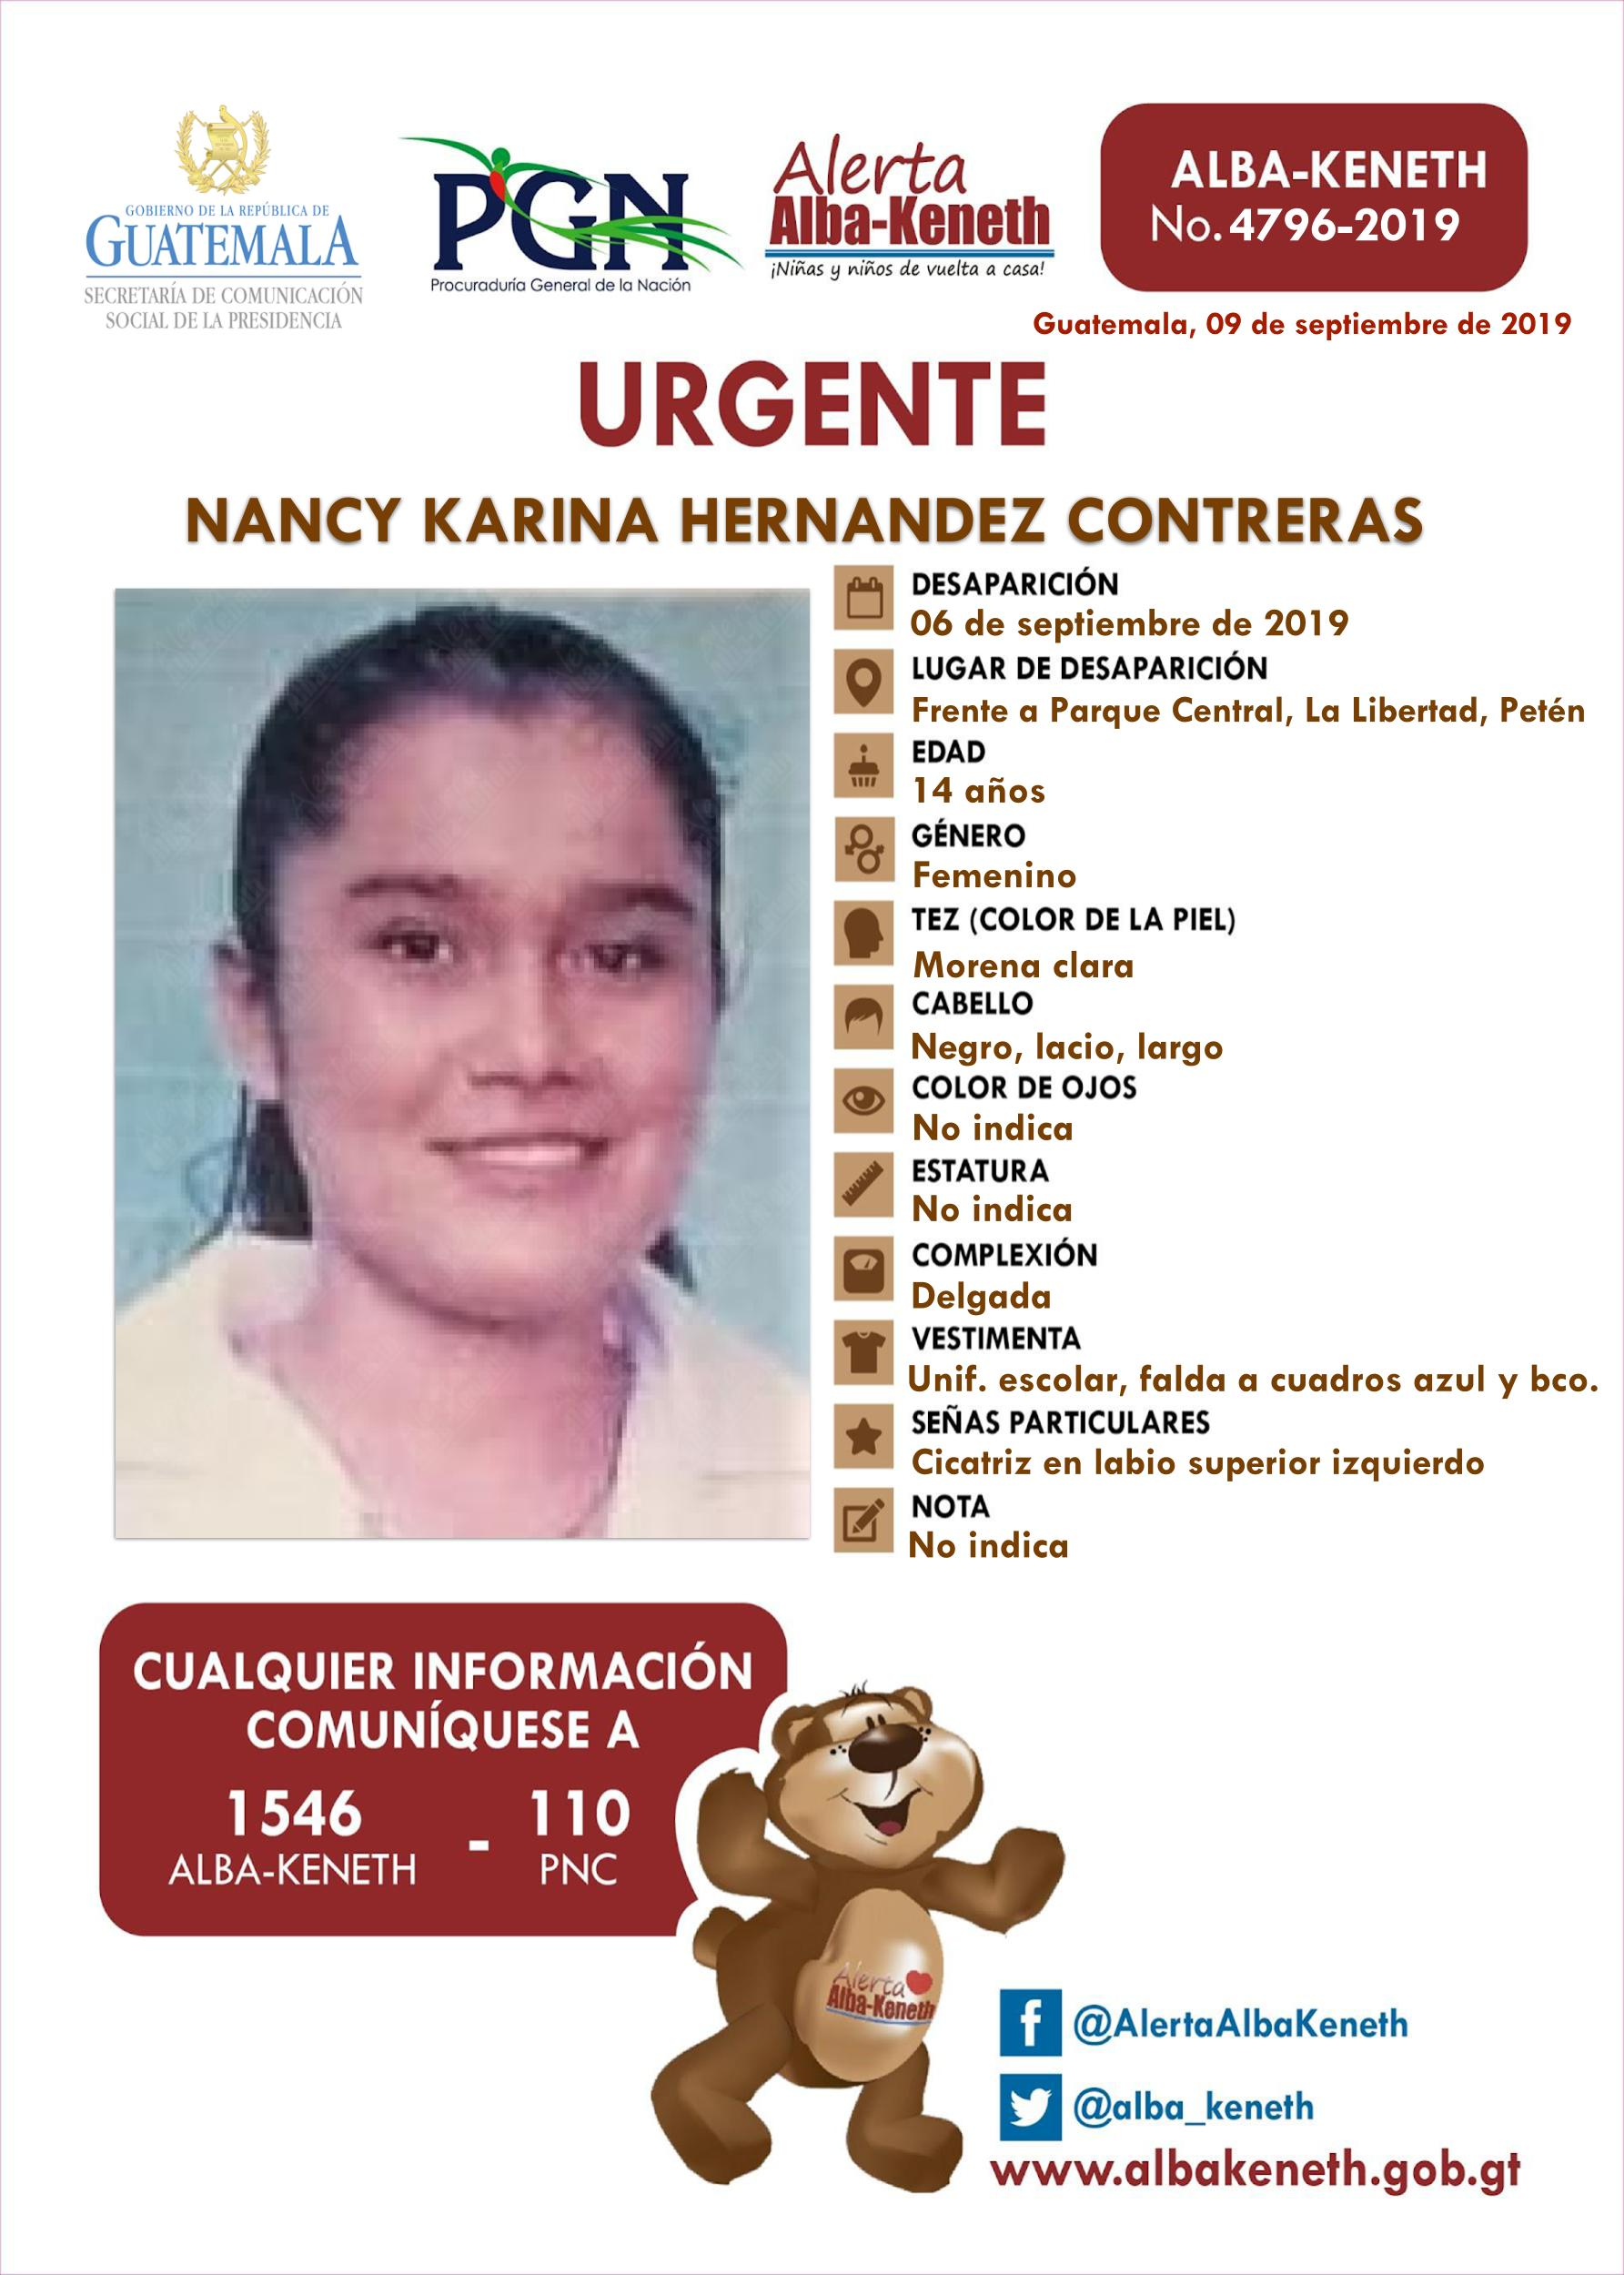 Nancy Karina Hernandez Contreras